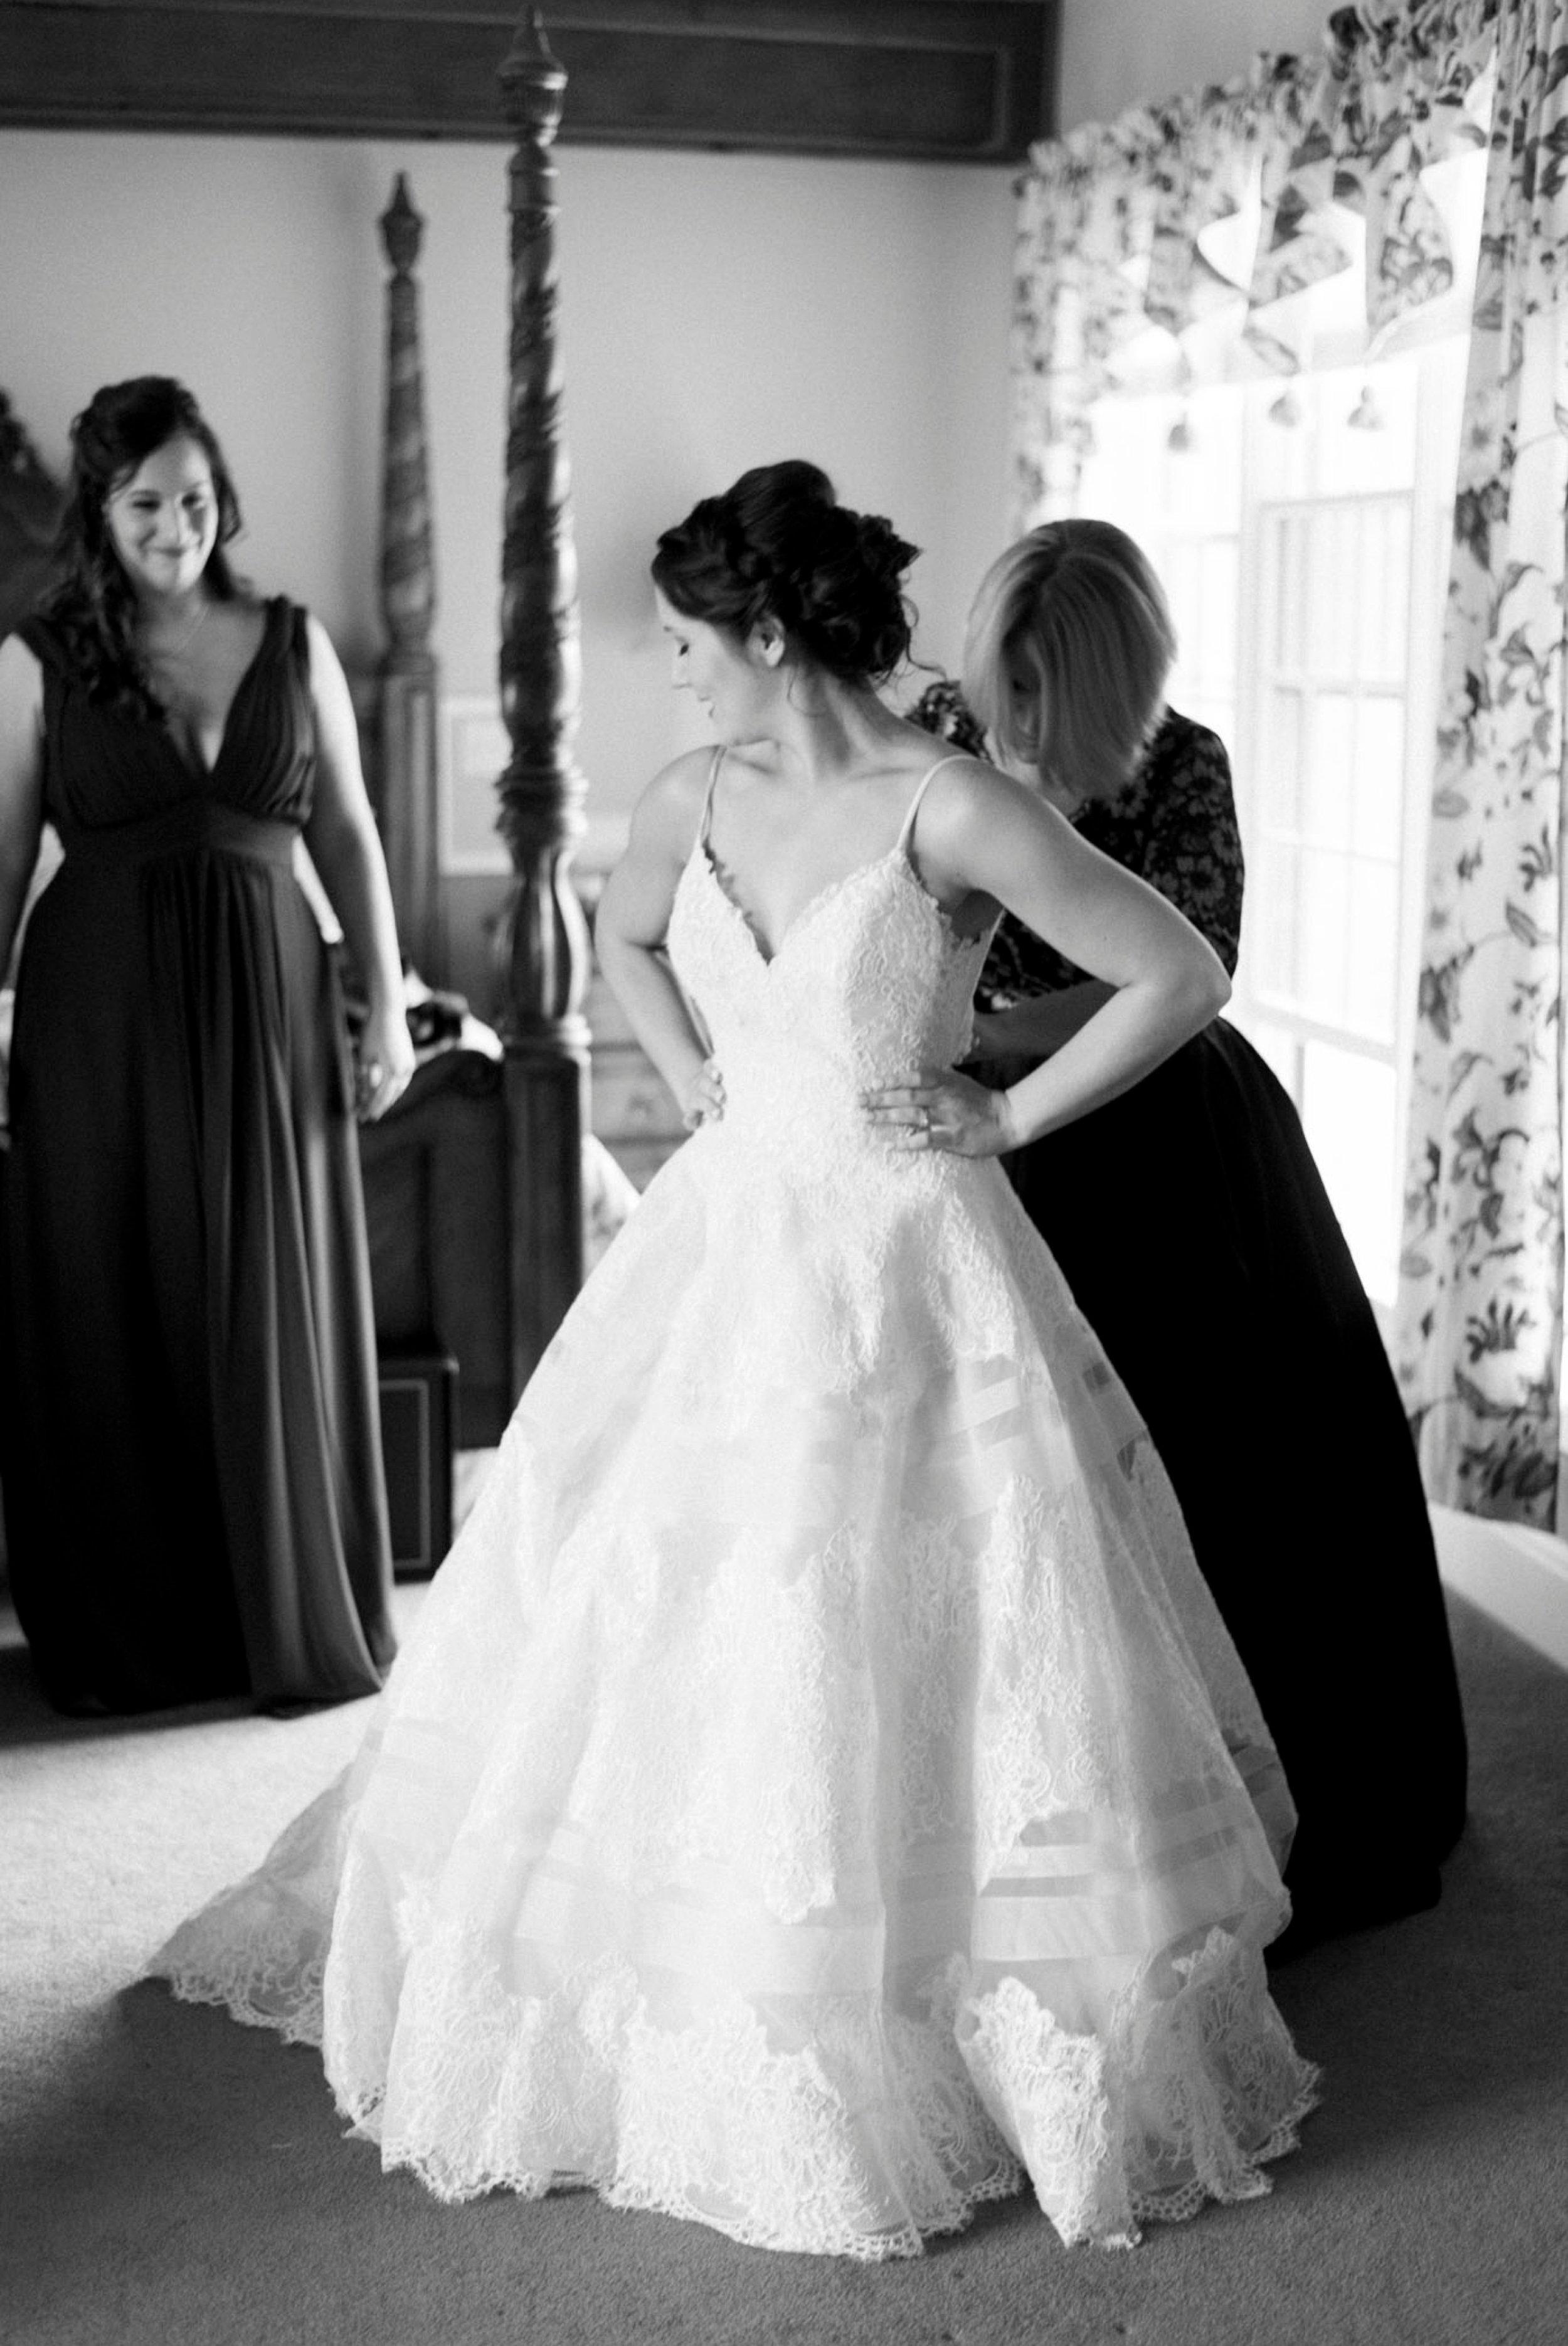 IrvineEstate_LexingtonVA_Wedding_FallWedding_VirginiaWeddingPhotographer 10.jpg